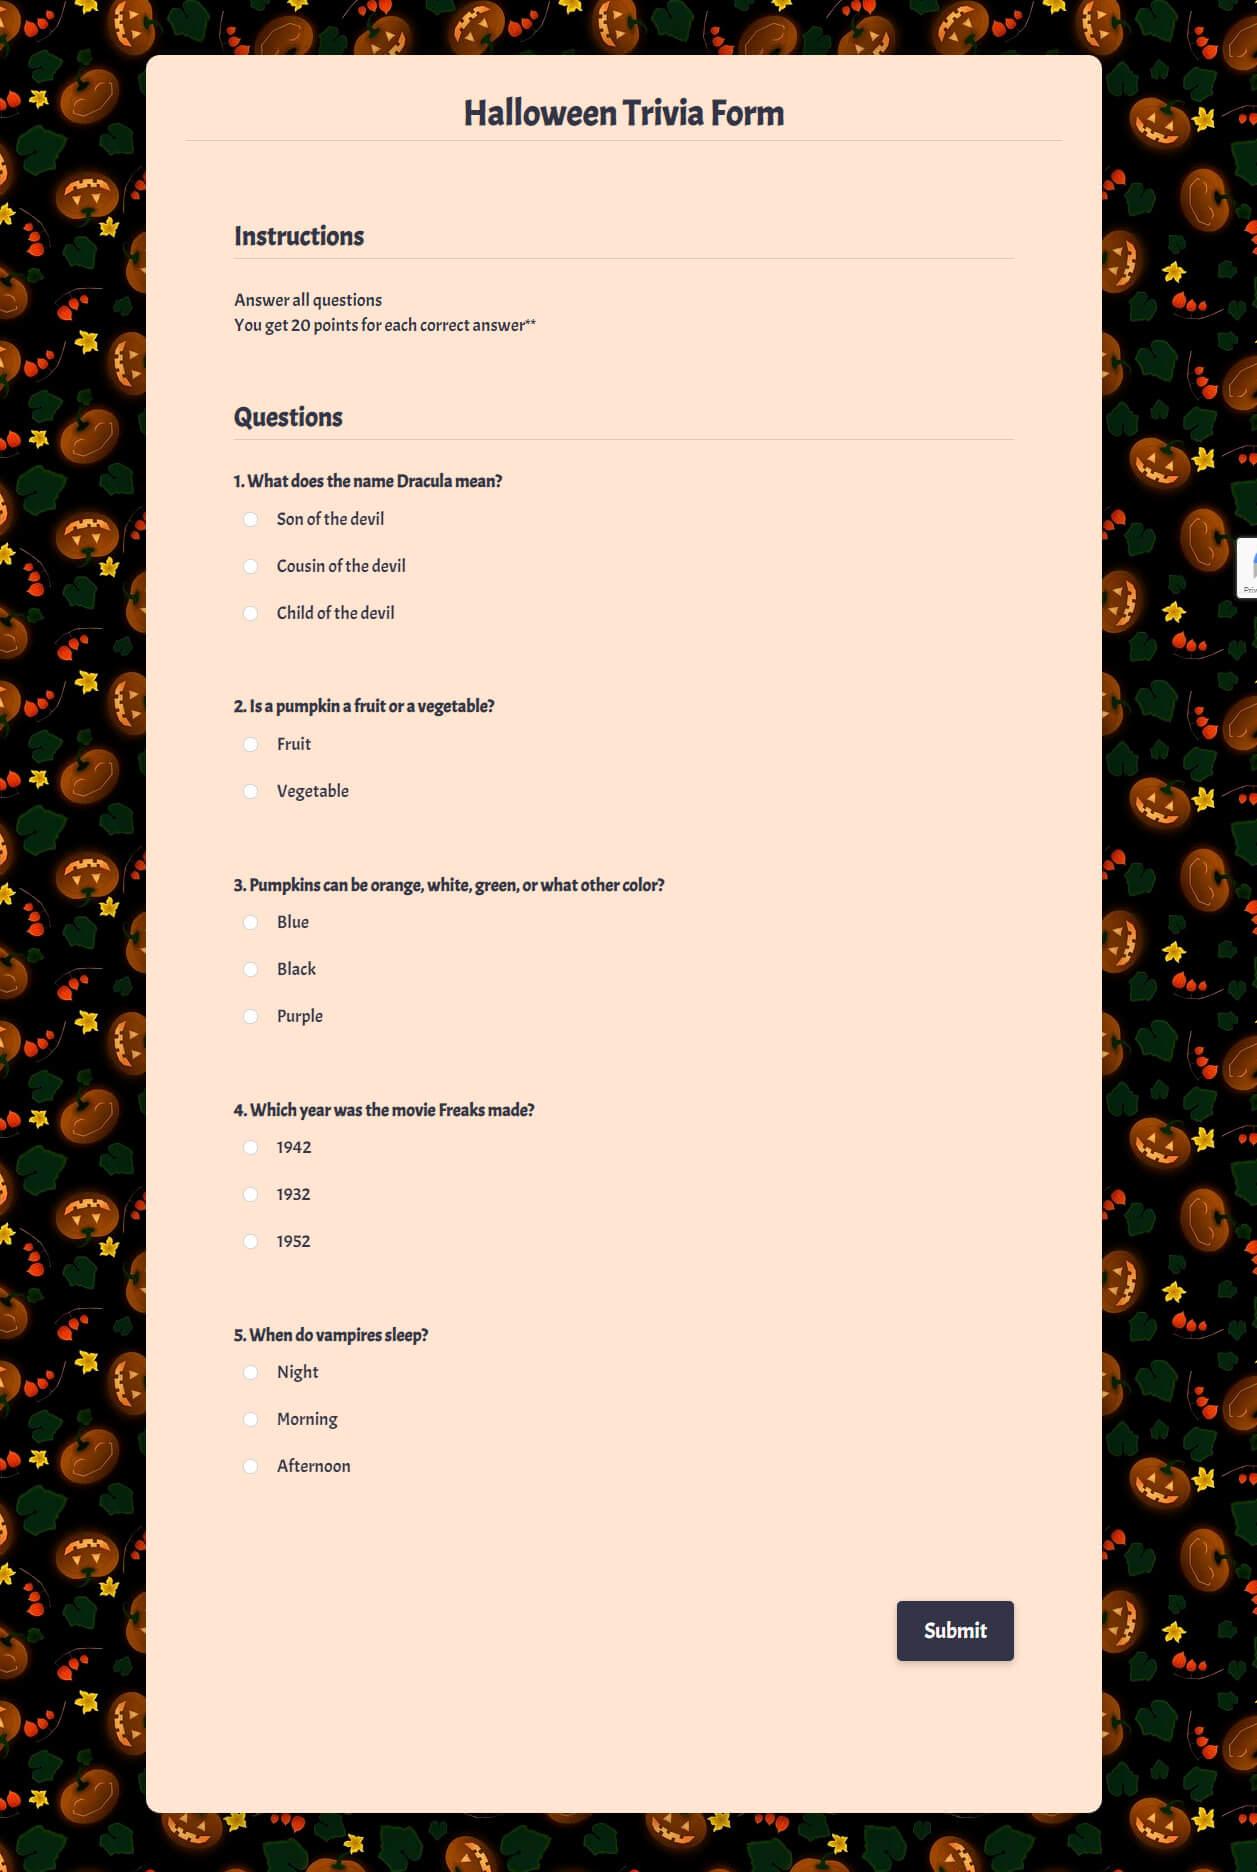 Halloween Trivia Form Template template